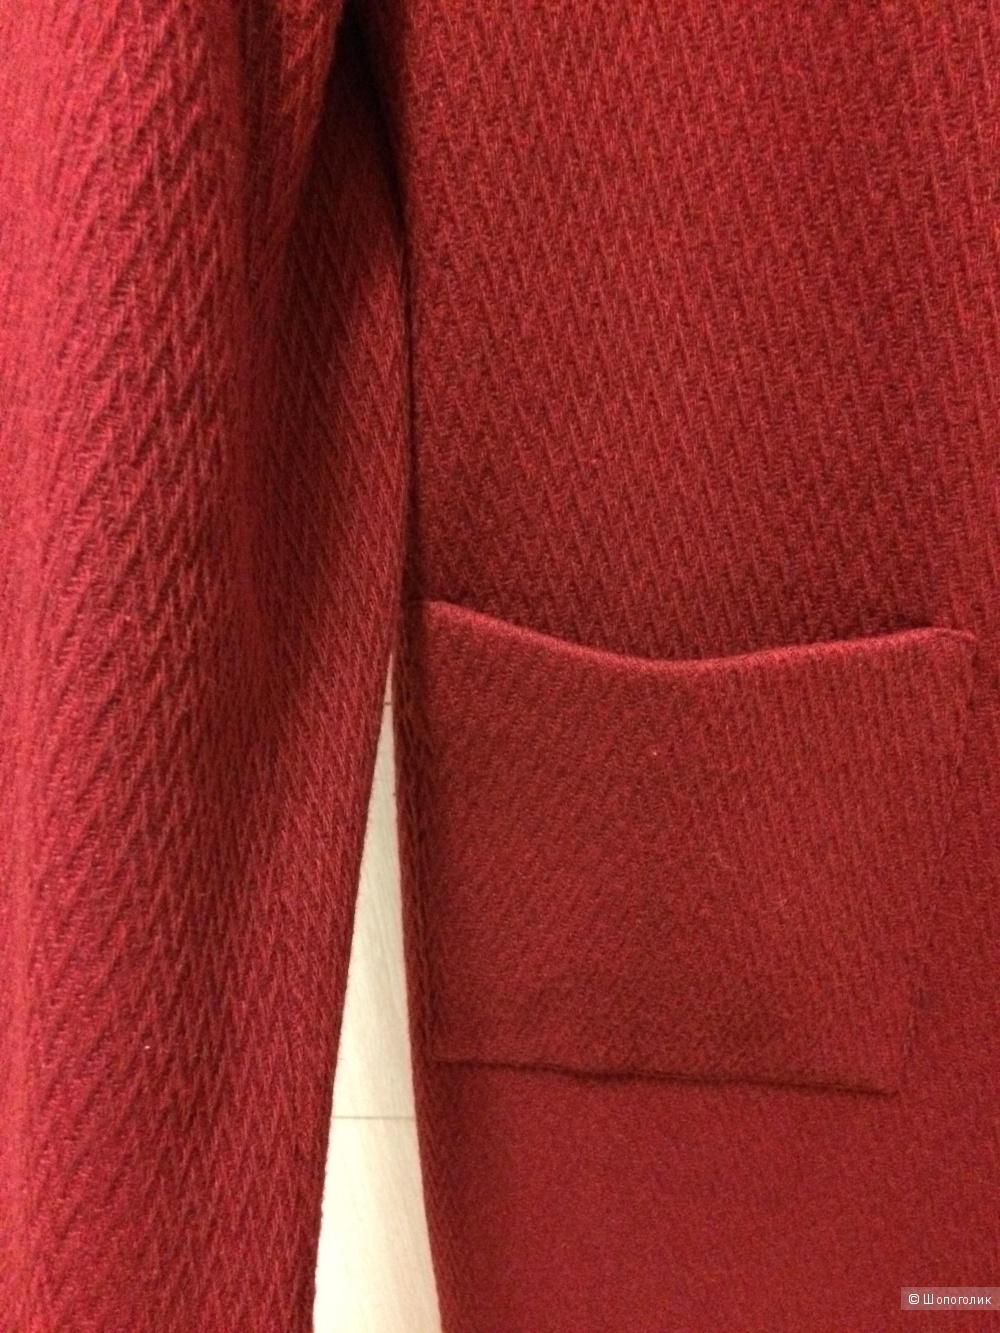 Пальто бордовое Heine 30% шерсти 48-50 размер